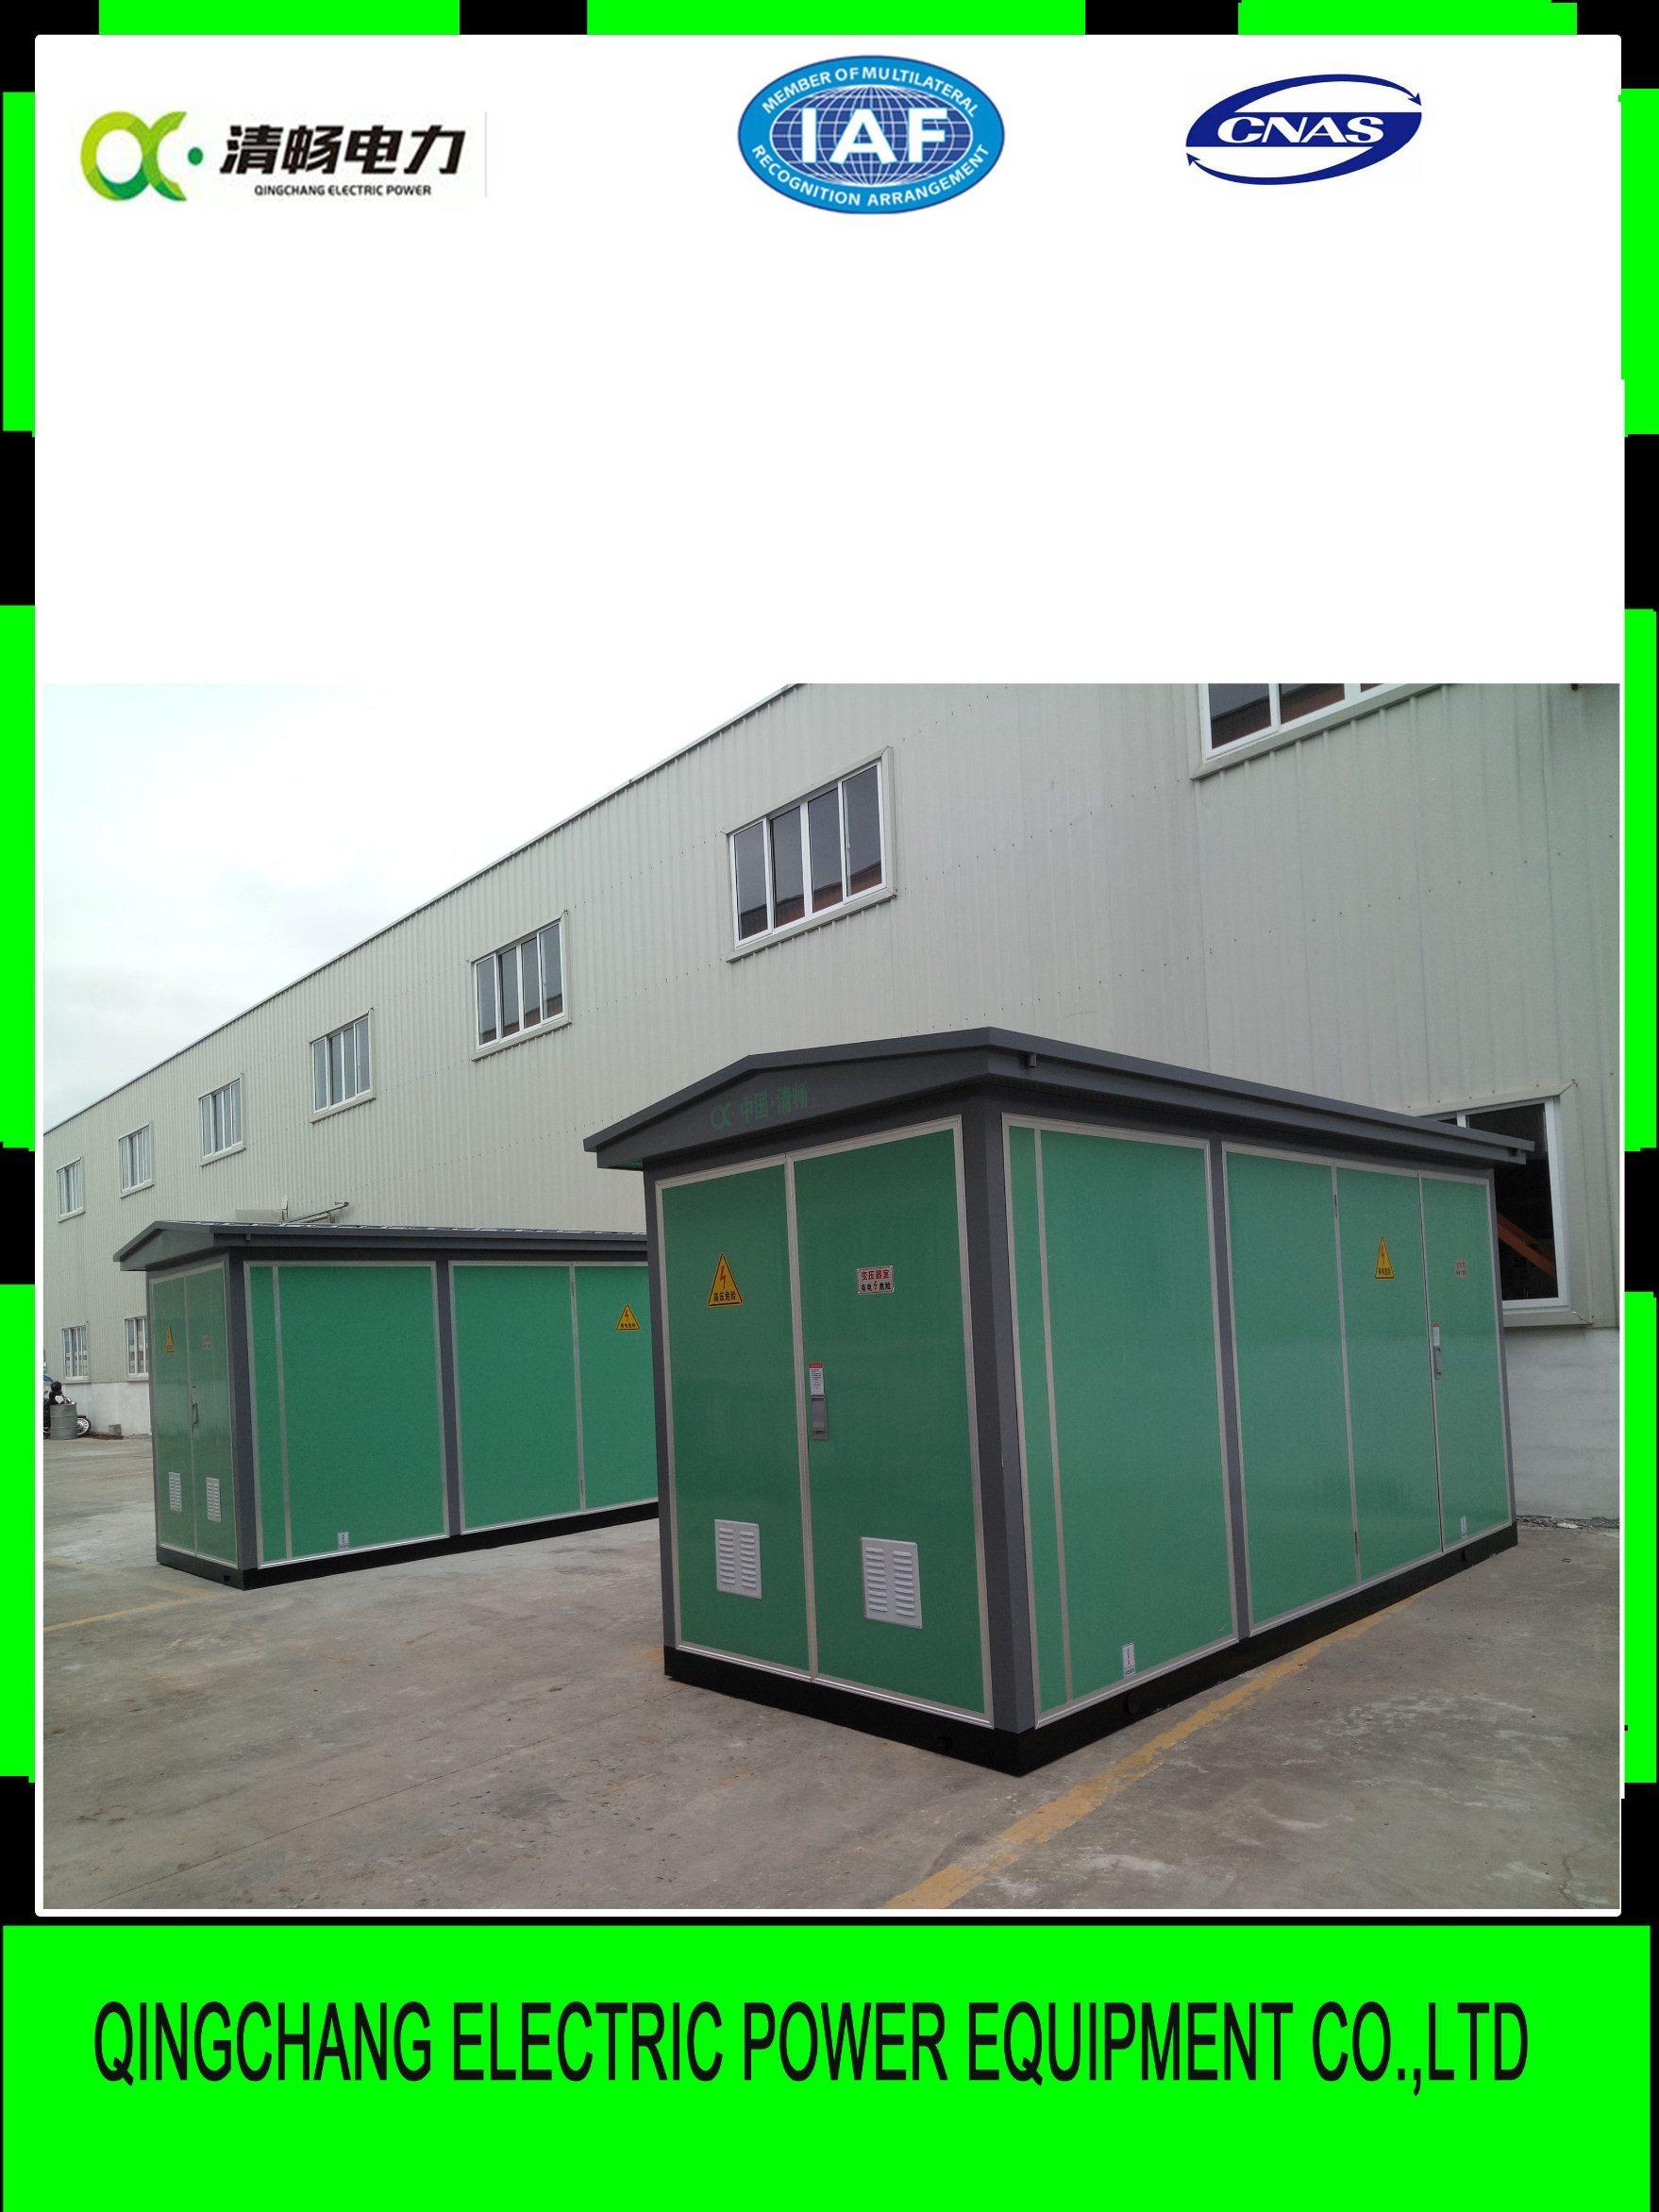 Yb Mv / LV Prefabricated Substation